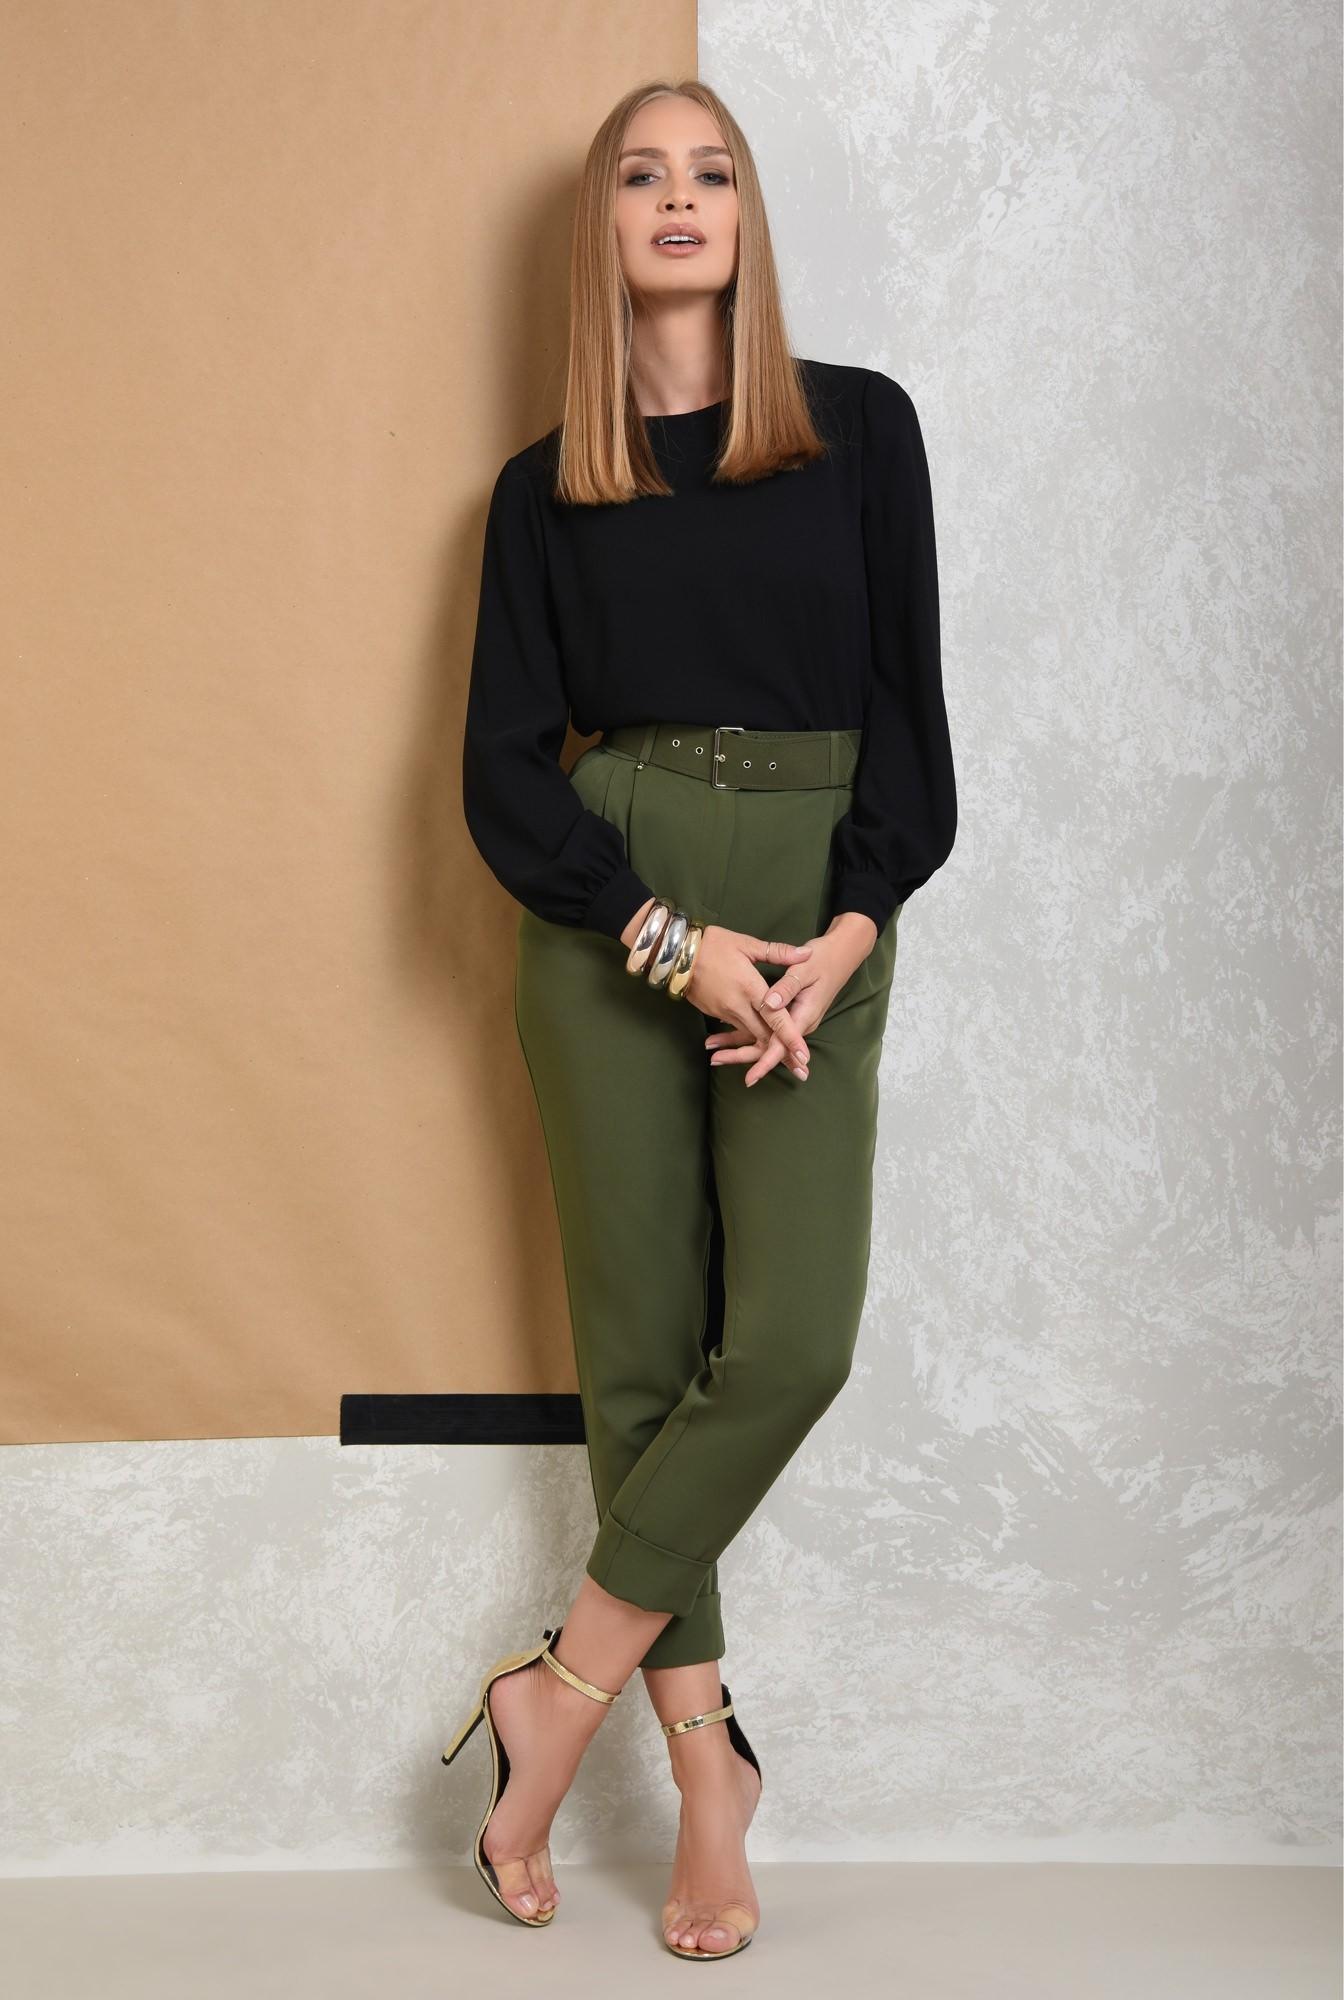 3 - pantaloni de dama, pantaloni online, verde kaki, curea, mansete